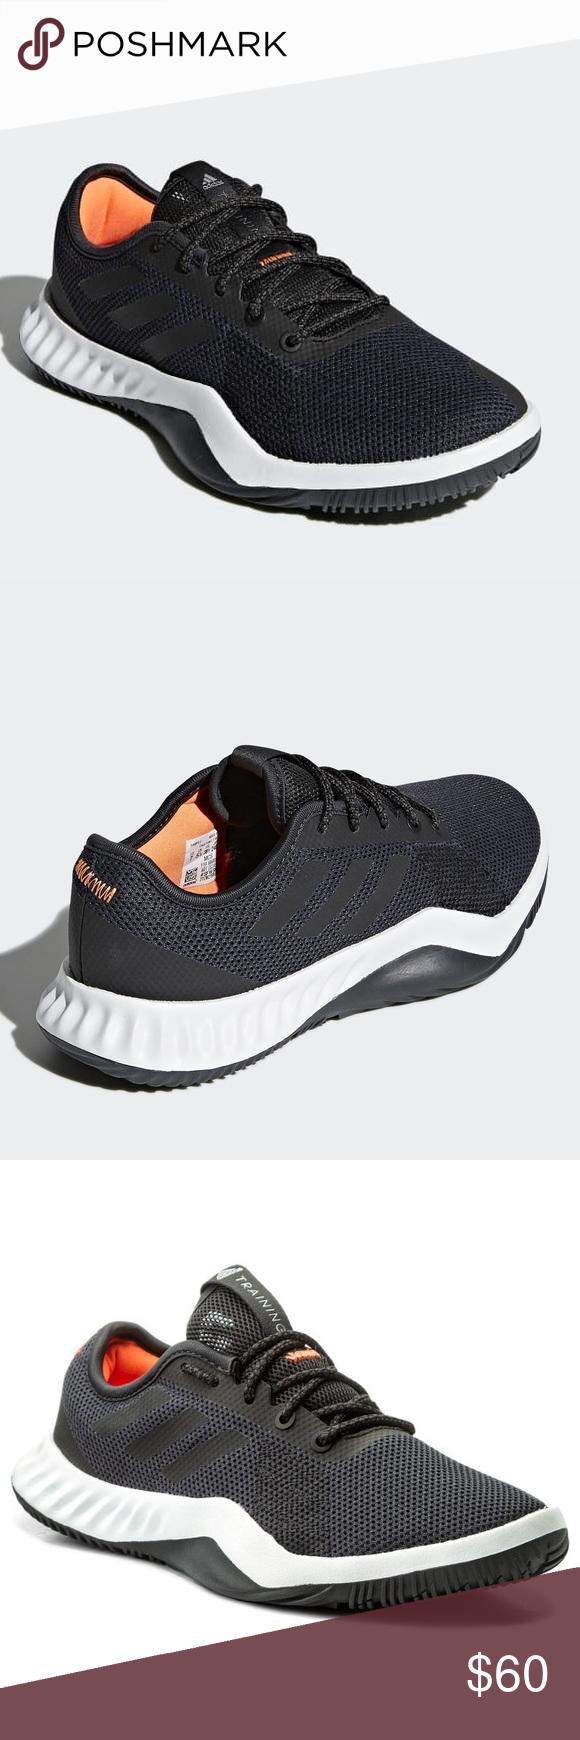 Rústico manual paso  Adidas CRAZYTRAIN LT SHOES CG3496 | Shoes, Clothes design, Fashion design